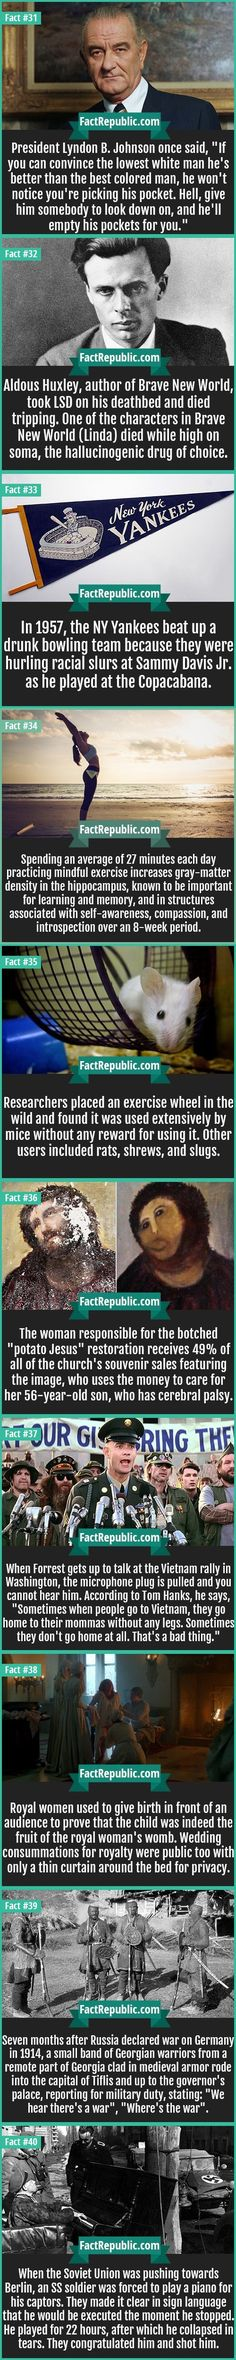 Facts Dose...  via: http://www.factrepublic.com